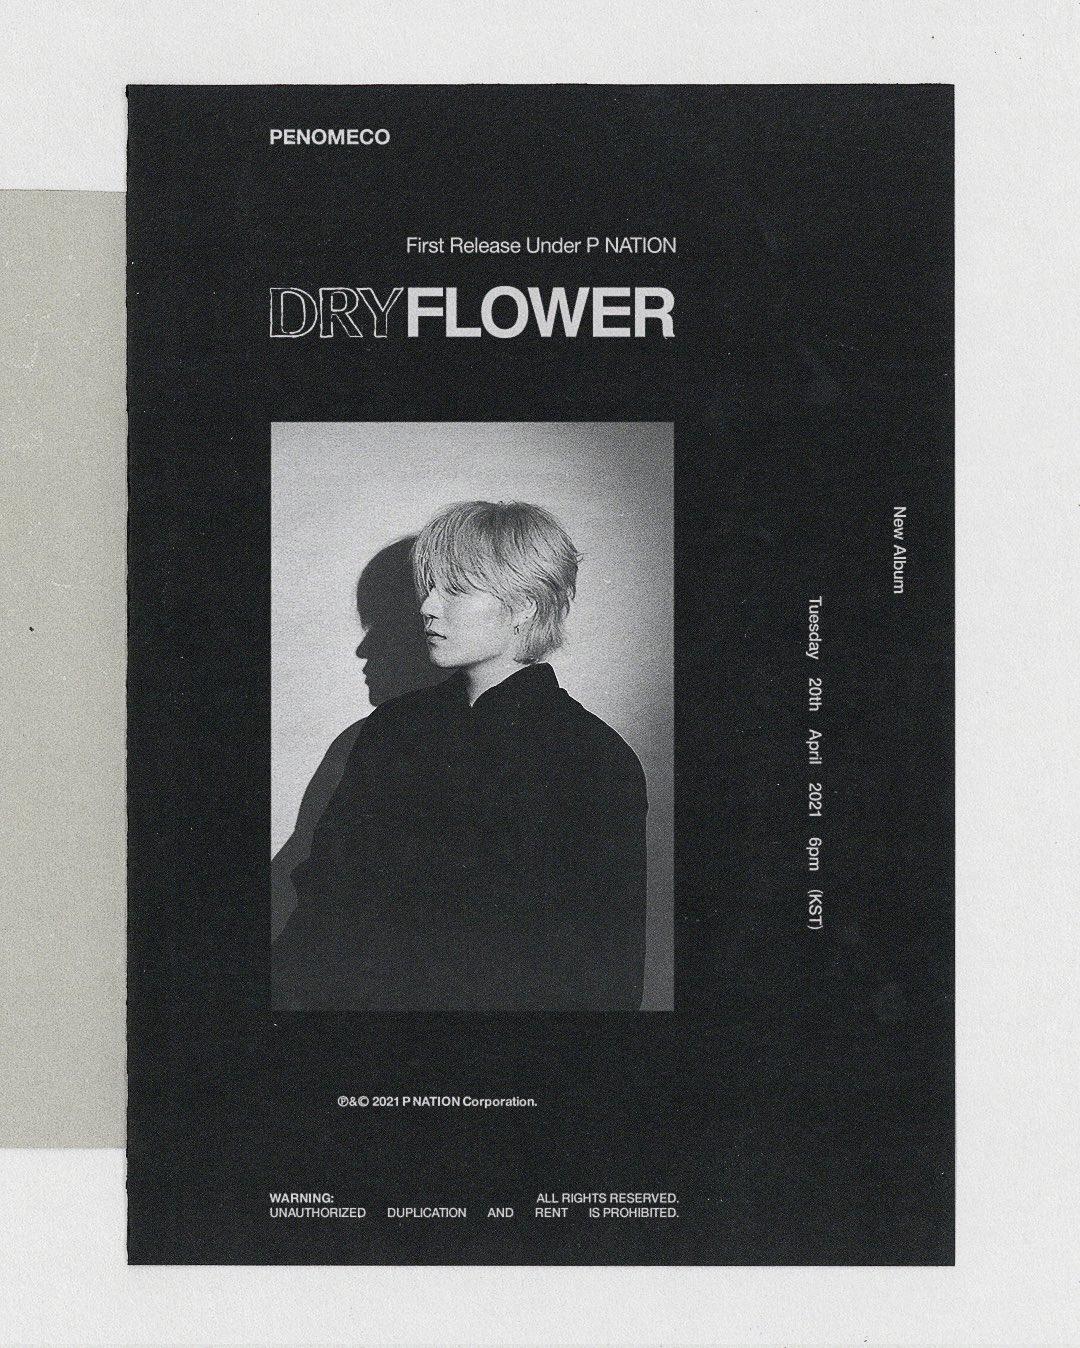 penomeco dry flower OfficialPnation twitter